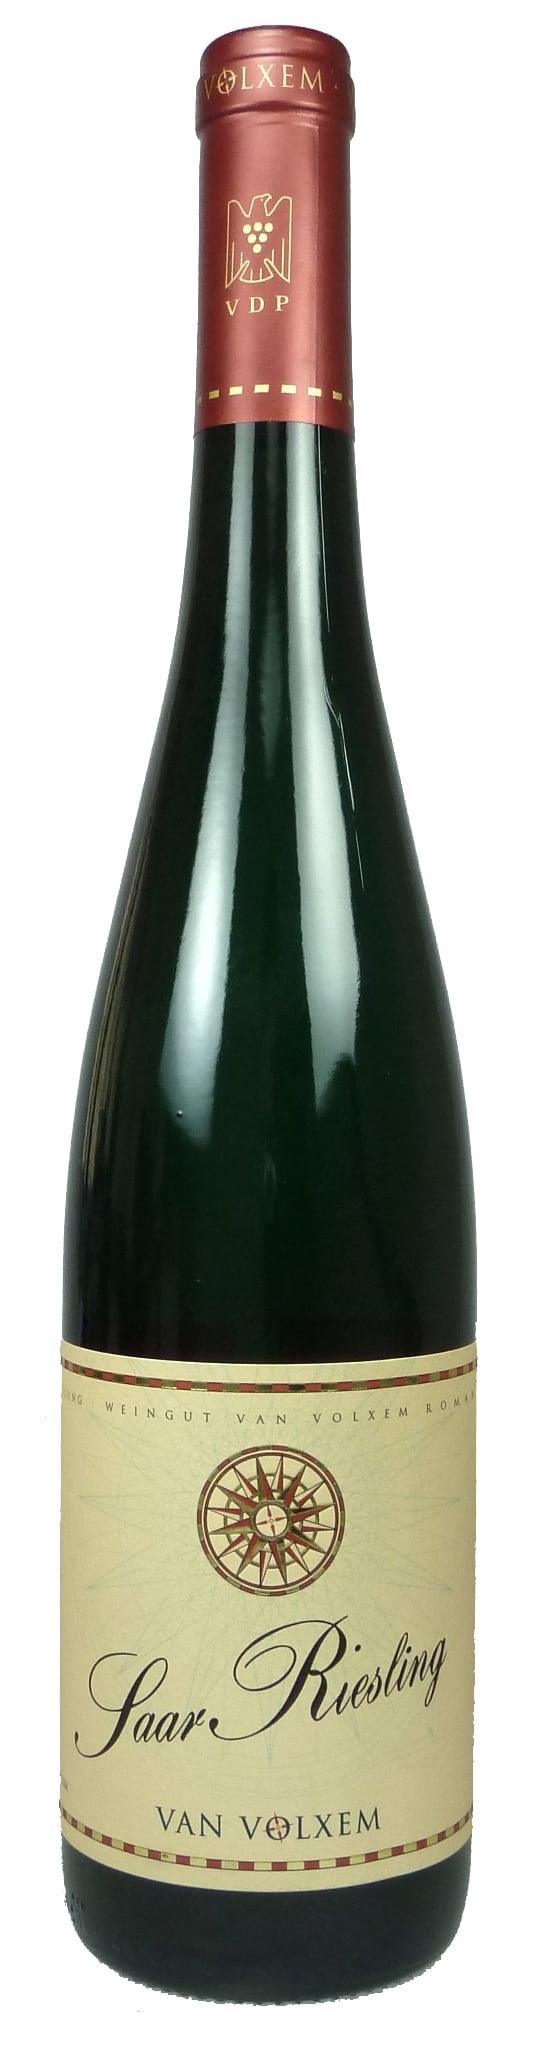 Saar Riesling Qualitätswein trocken  2017